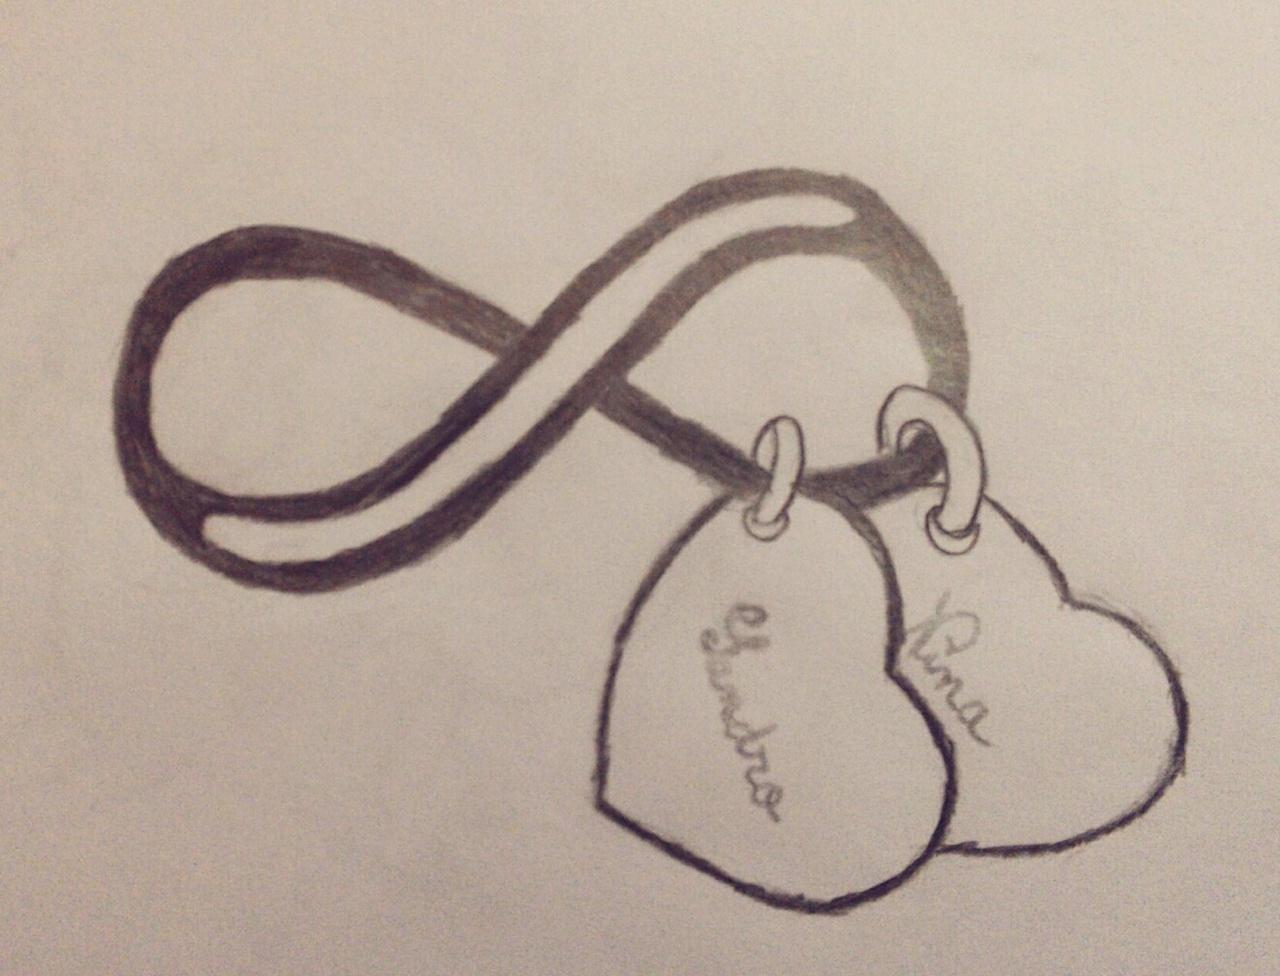 1280x976 I Draw It For My Best Friend On We Heart It